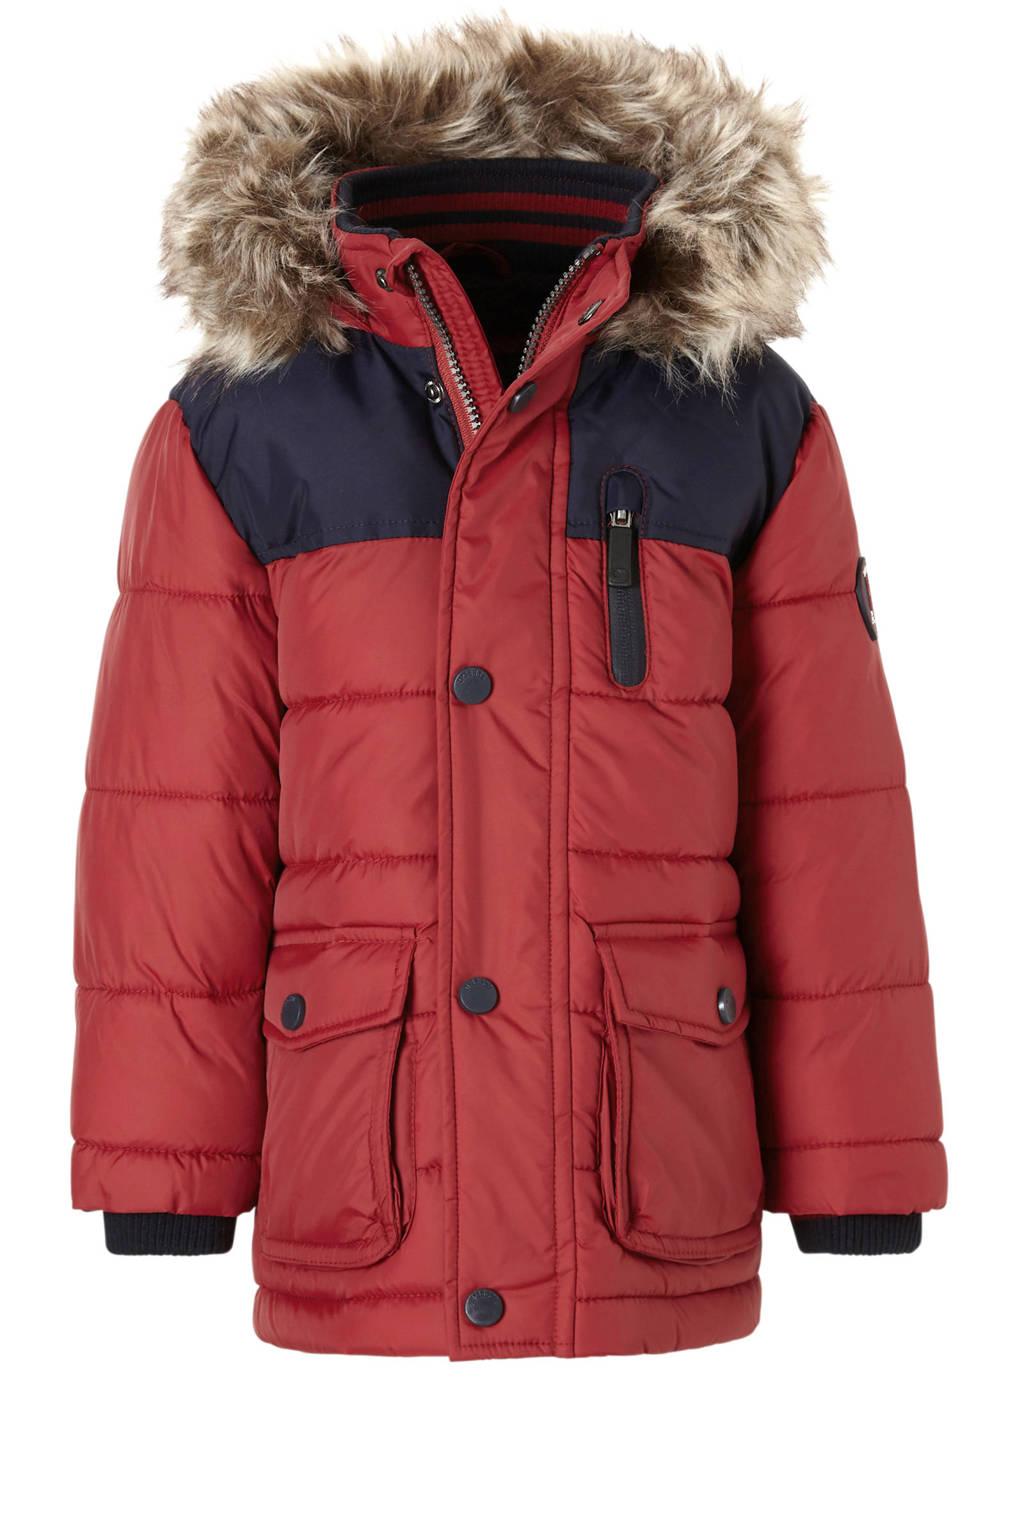 C&A Palomino winterjas  rood, Donkerrood